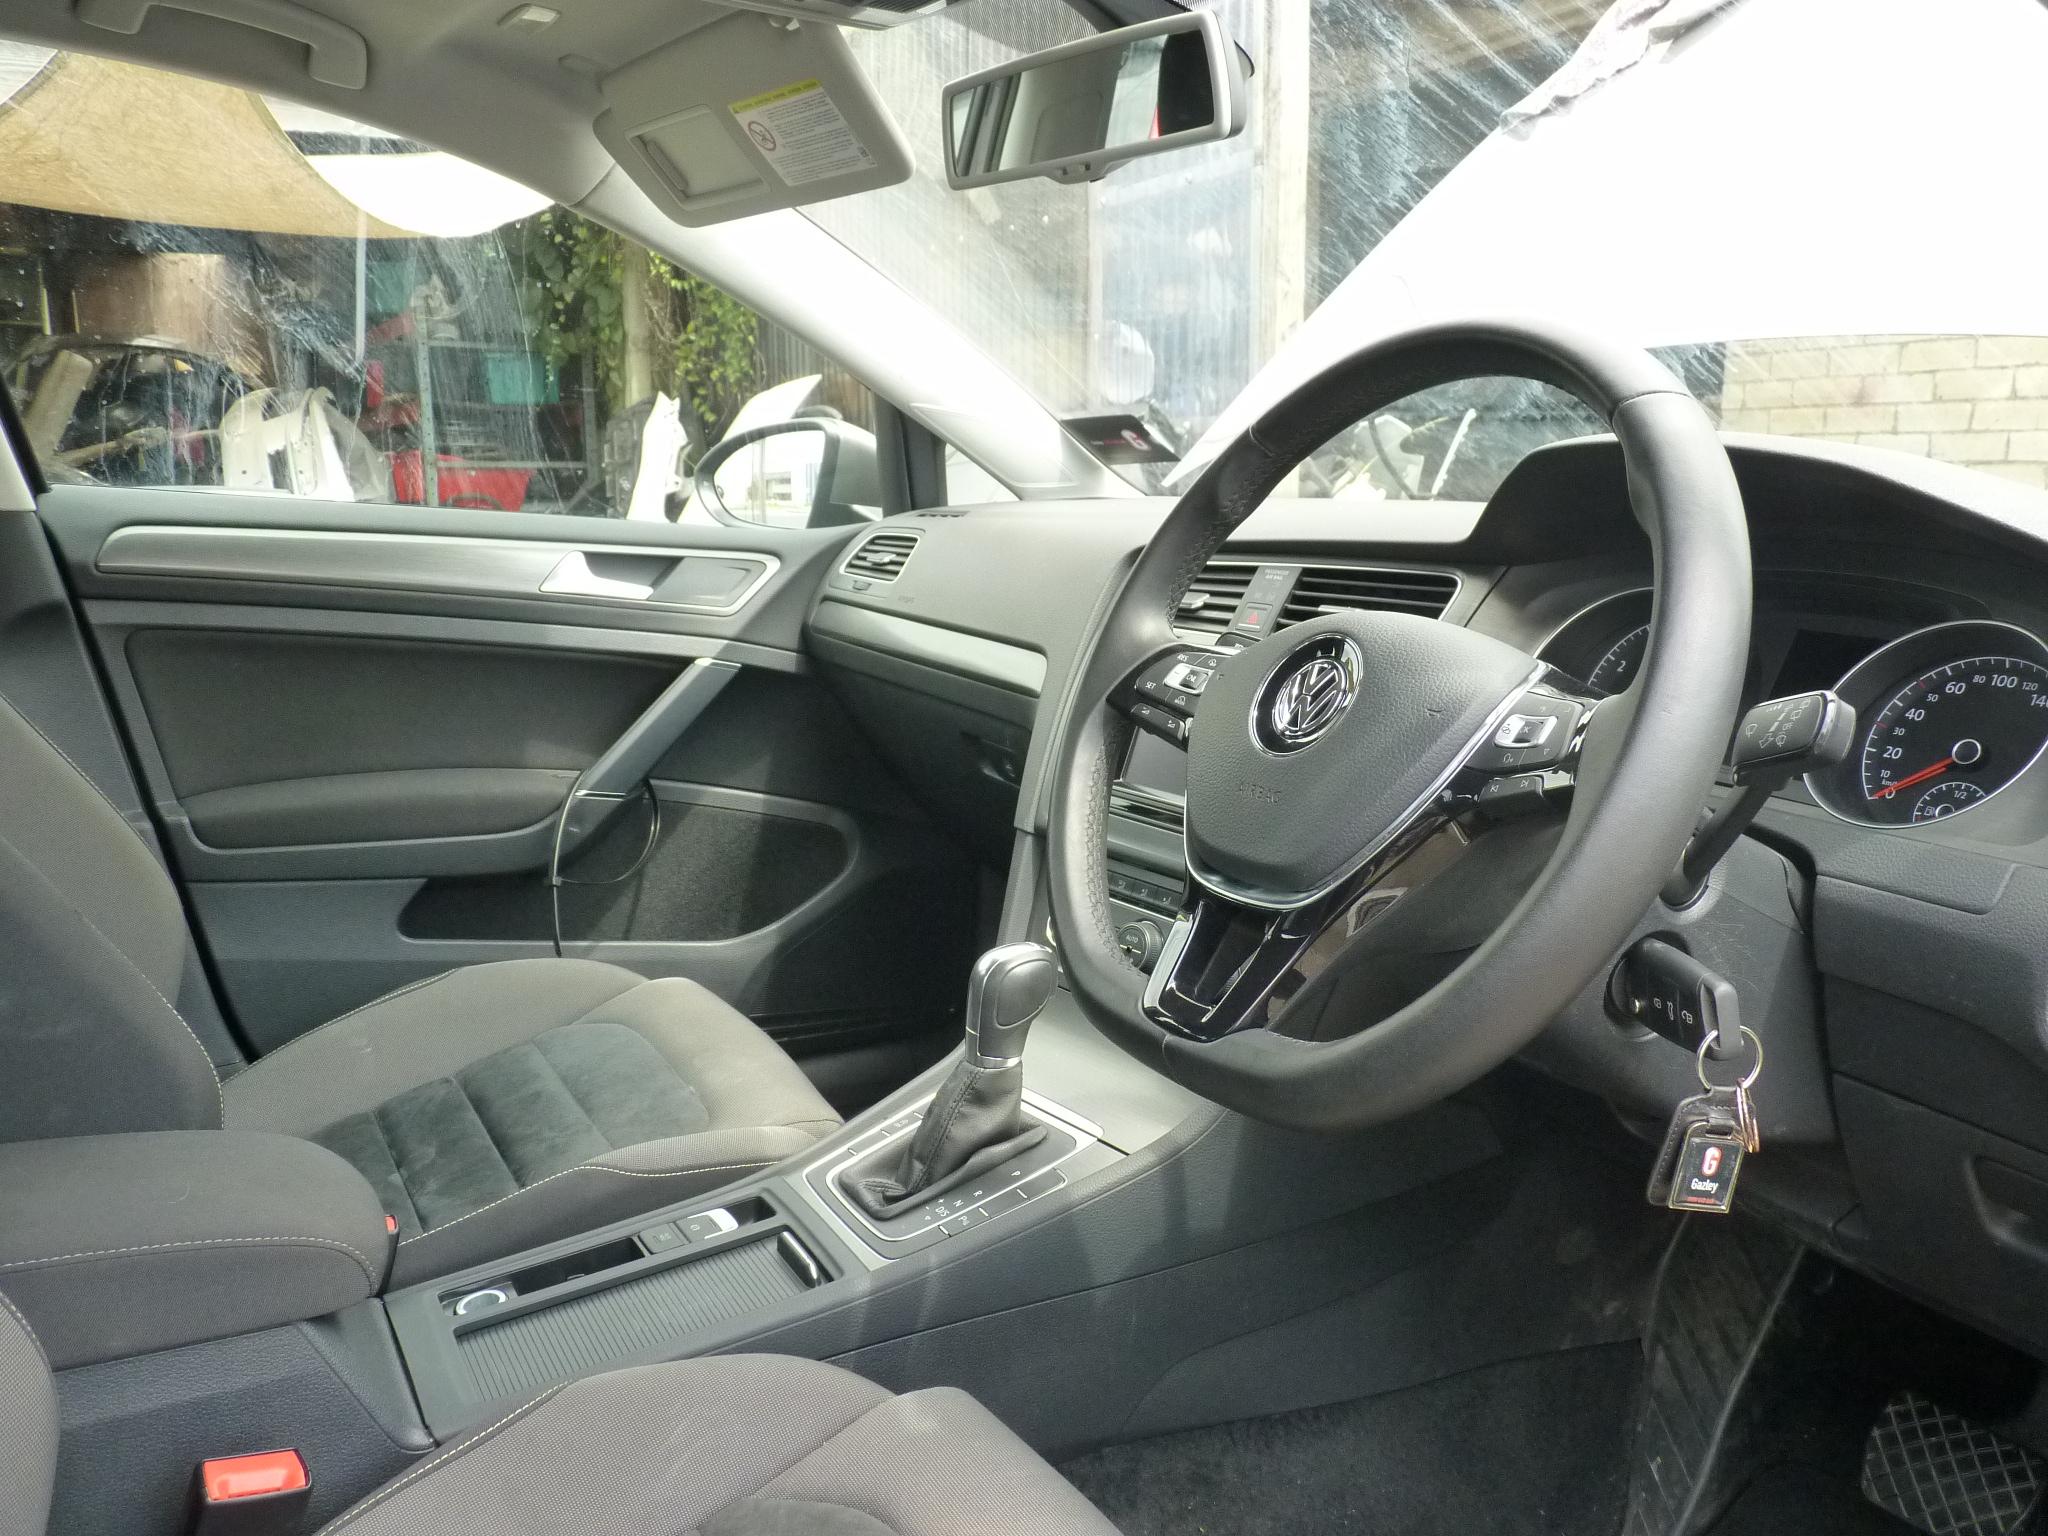 VW Golf 7 2014